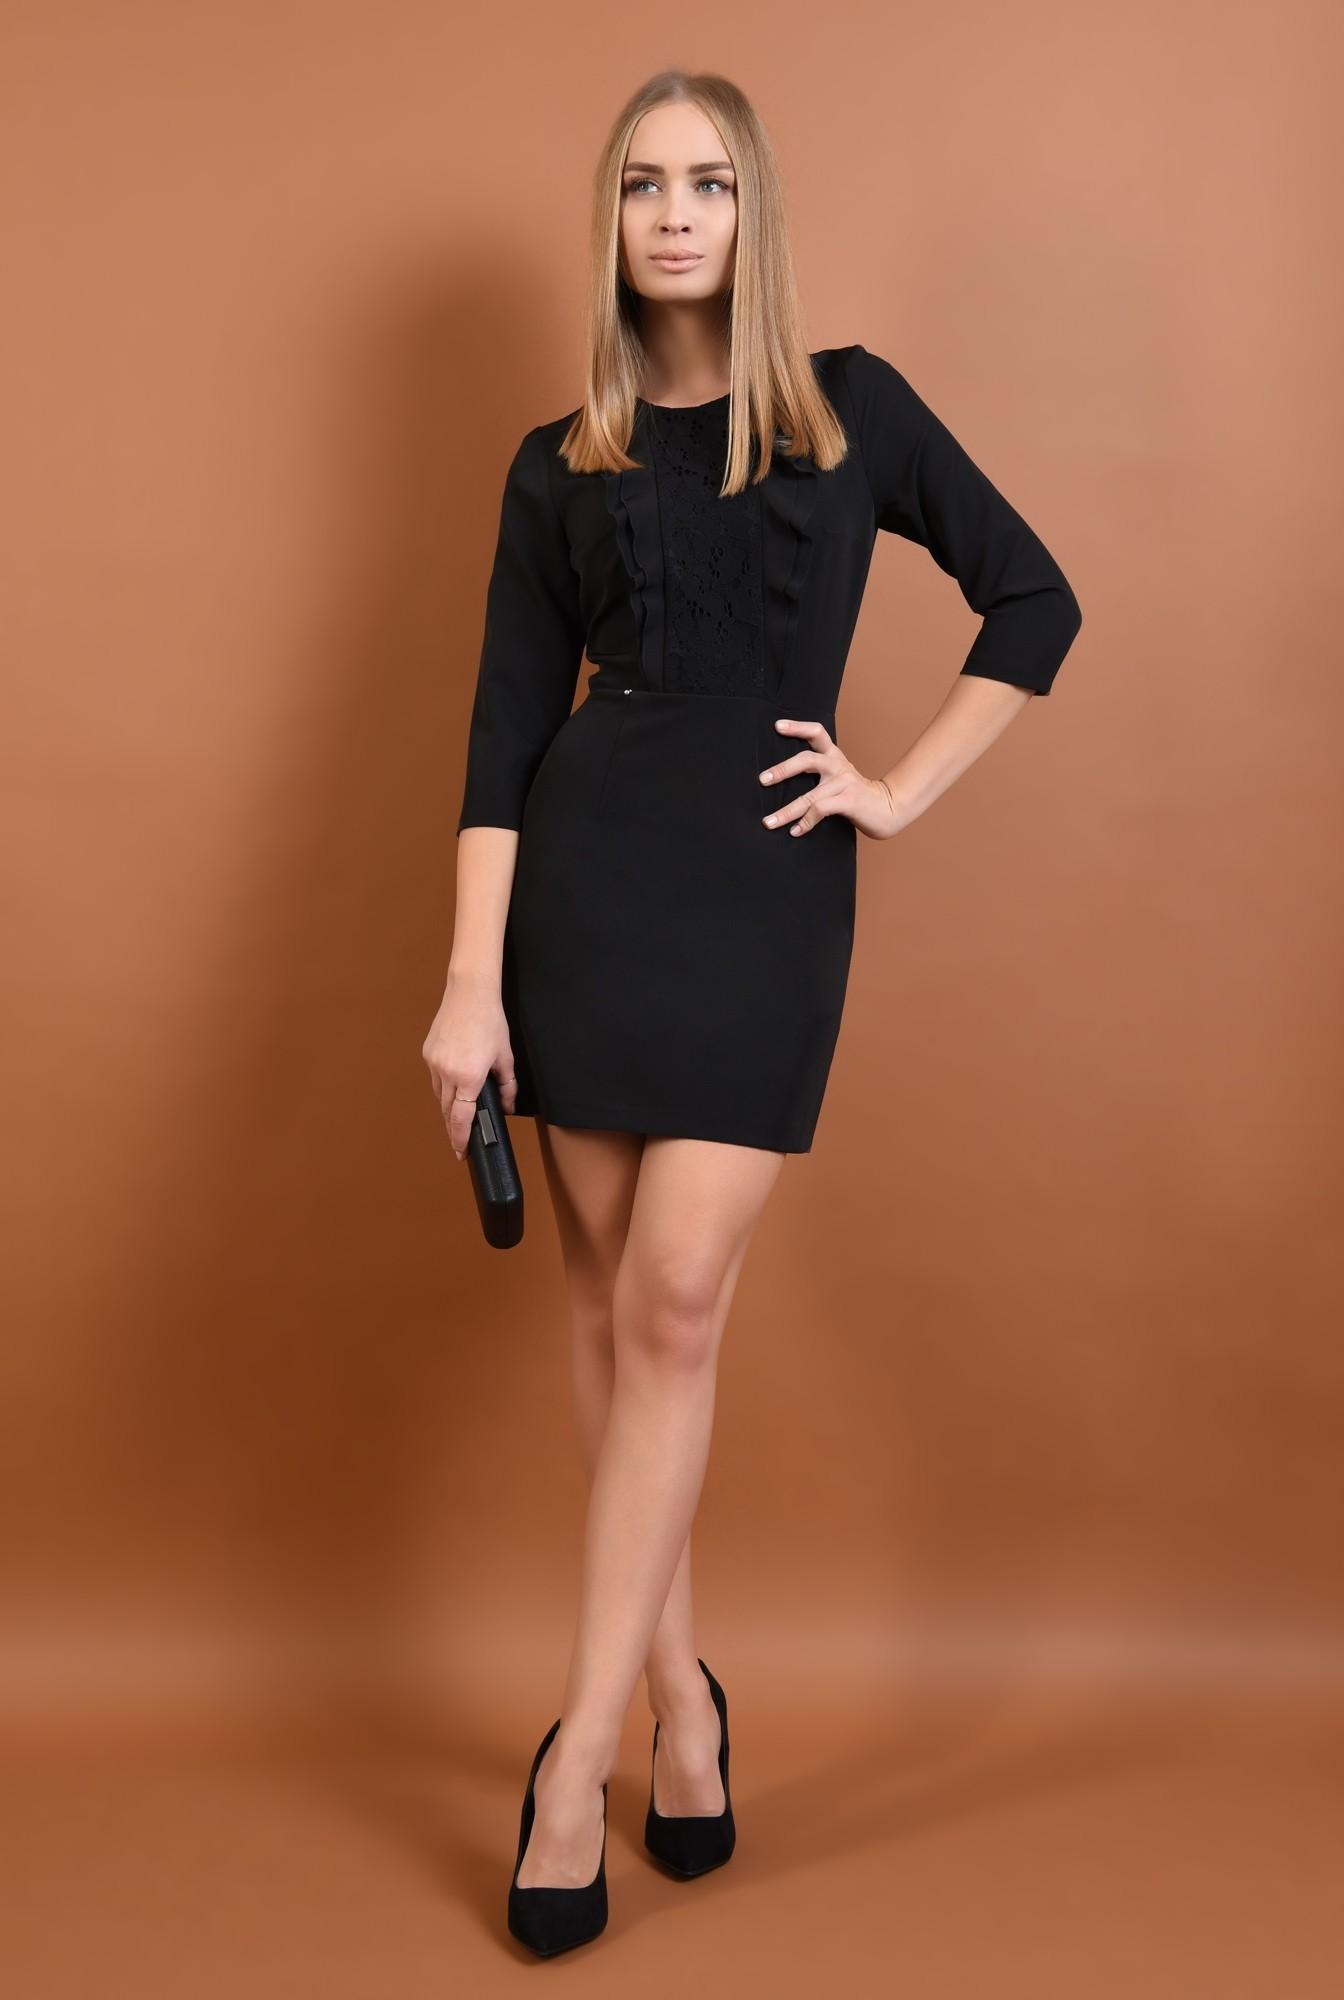 3 - 360 - rochie eleganta, cu volane, dantela aplicata, mini, croi cambrat, rochii online